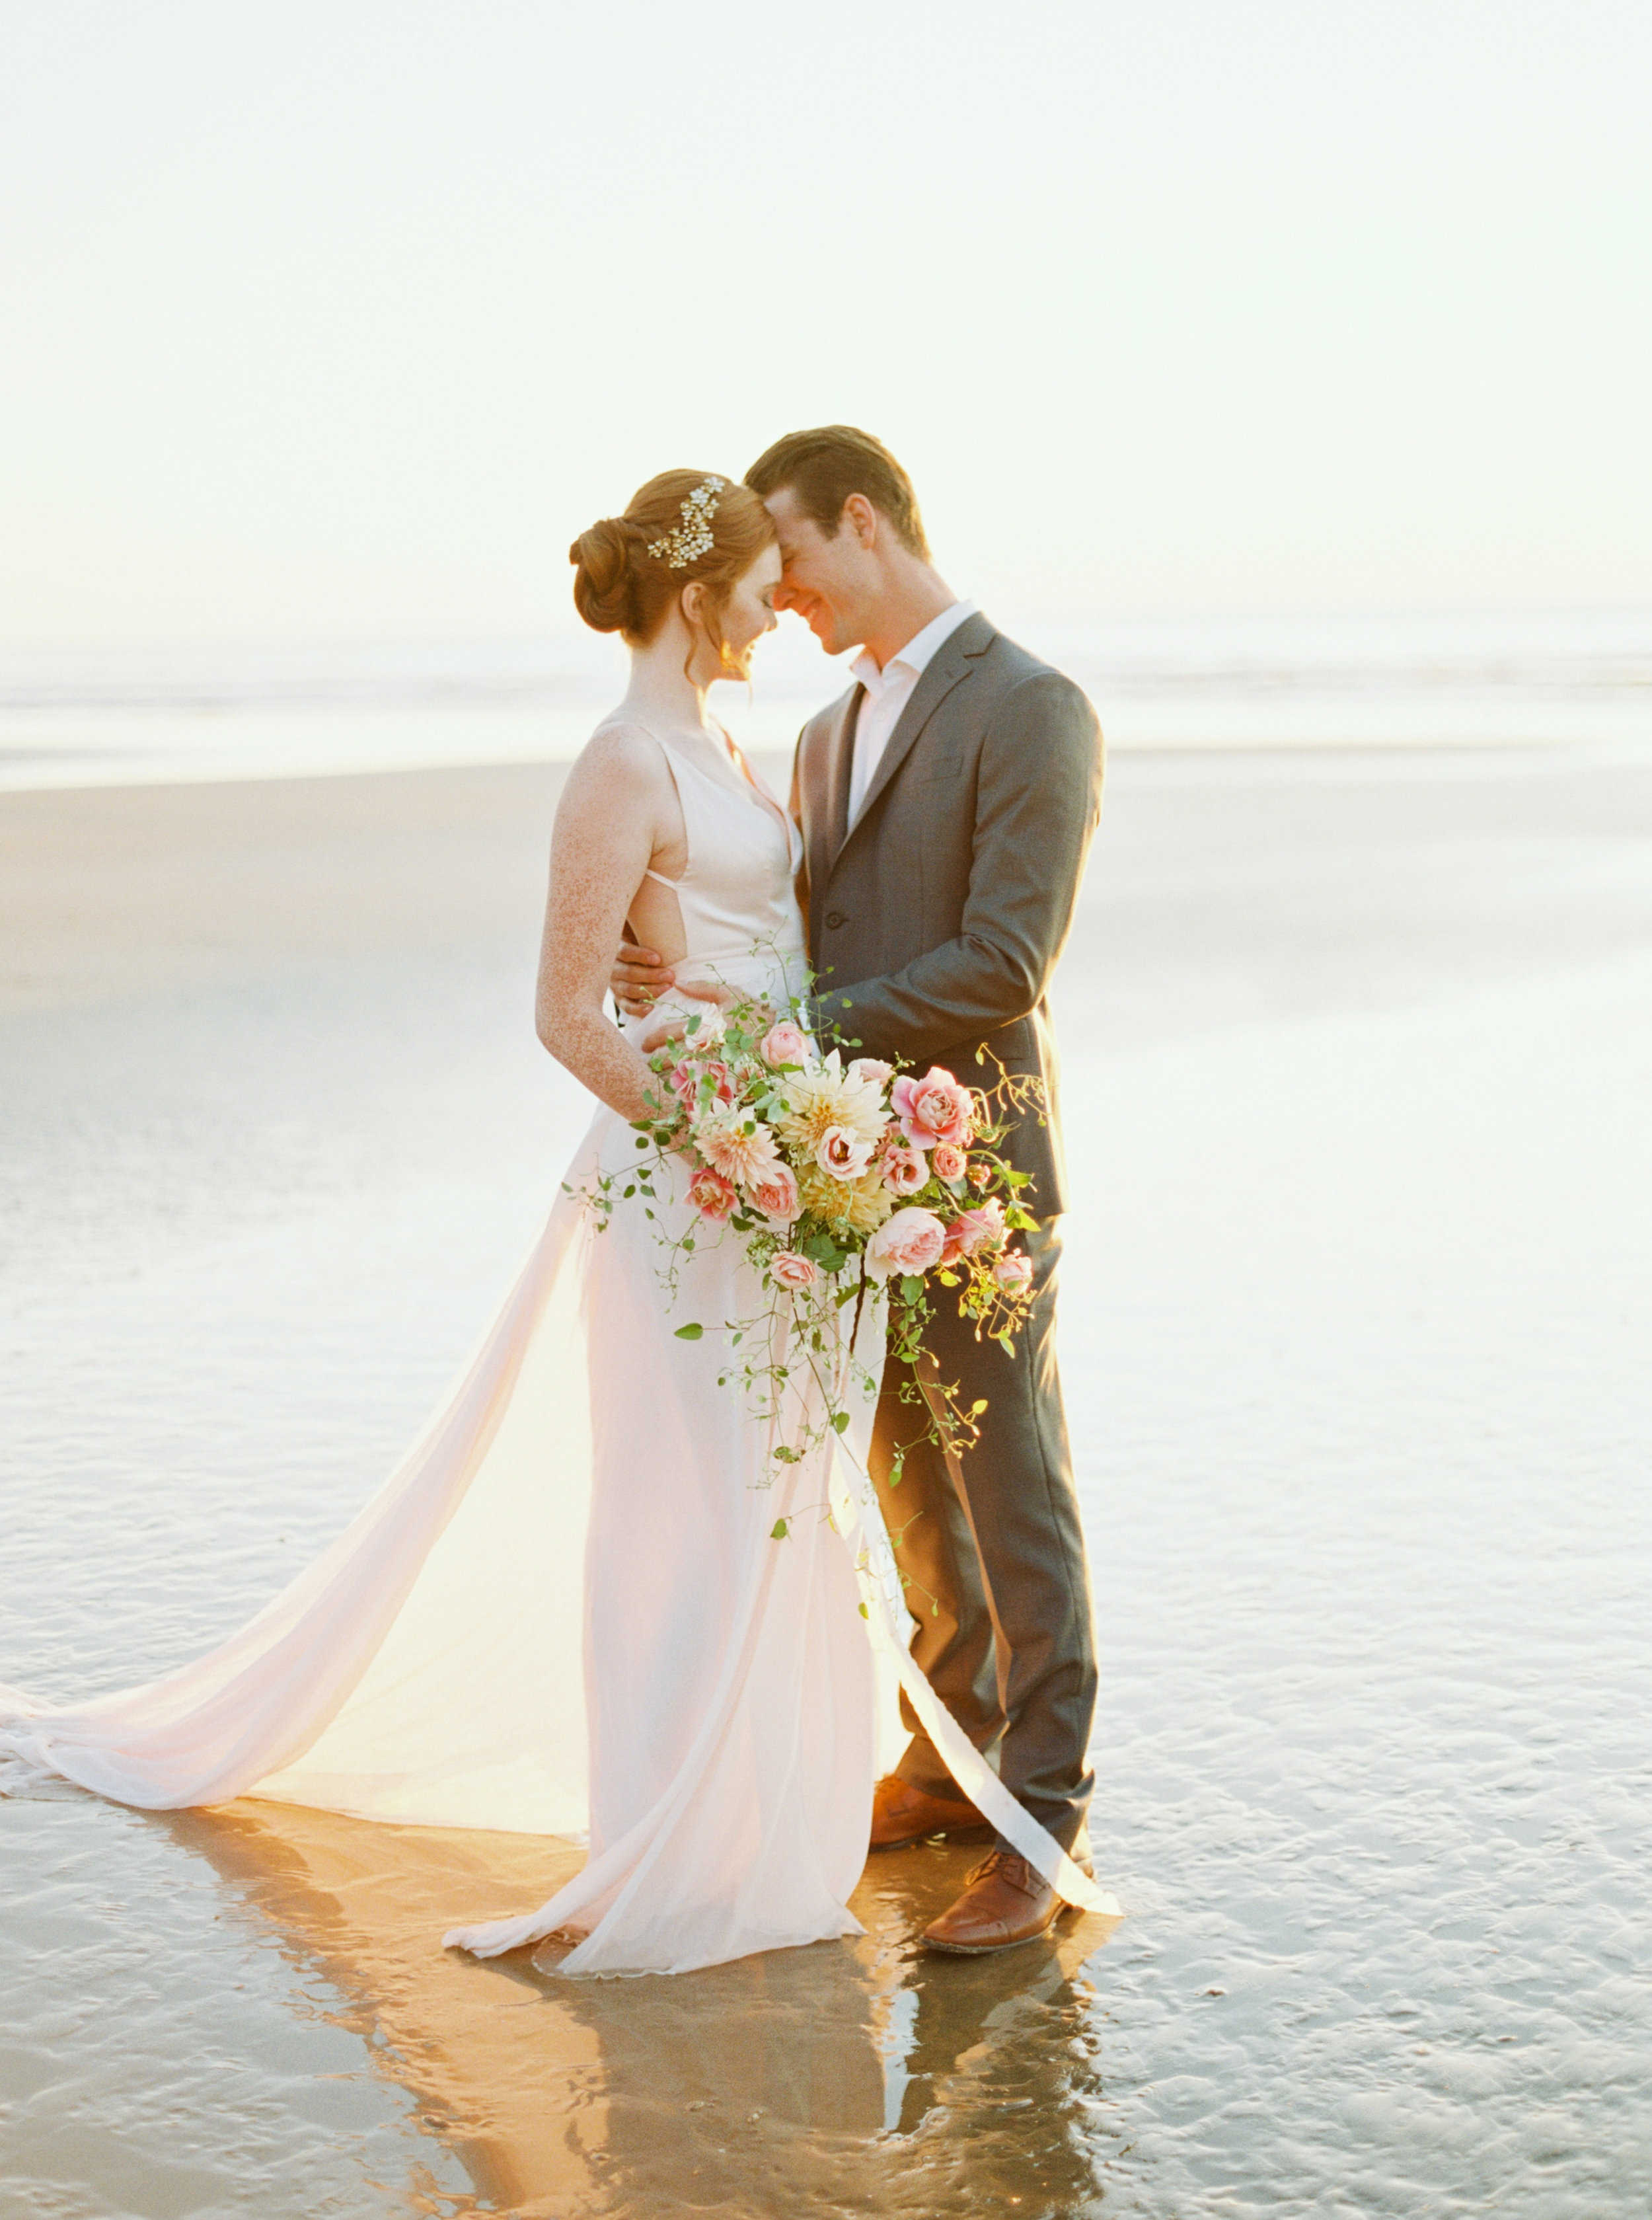 Cannon Beach Wedding Photography